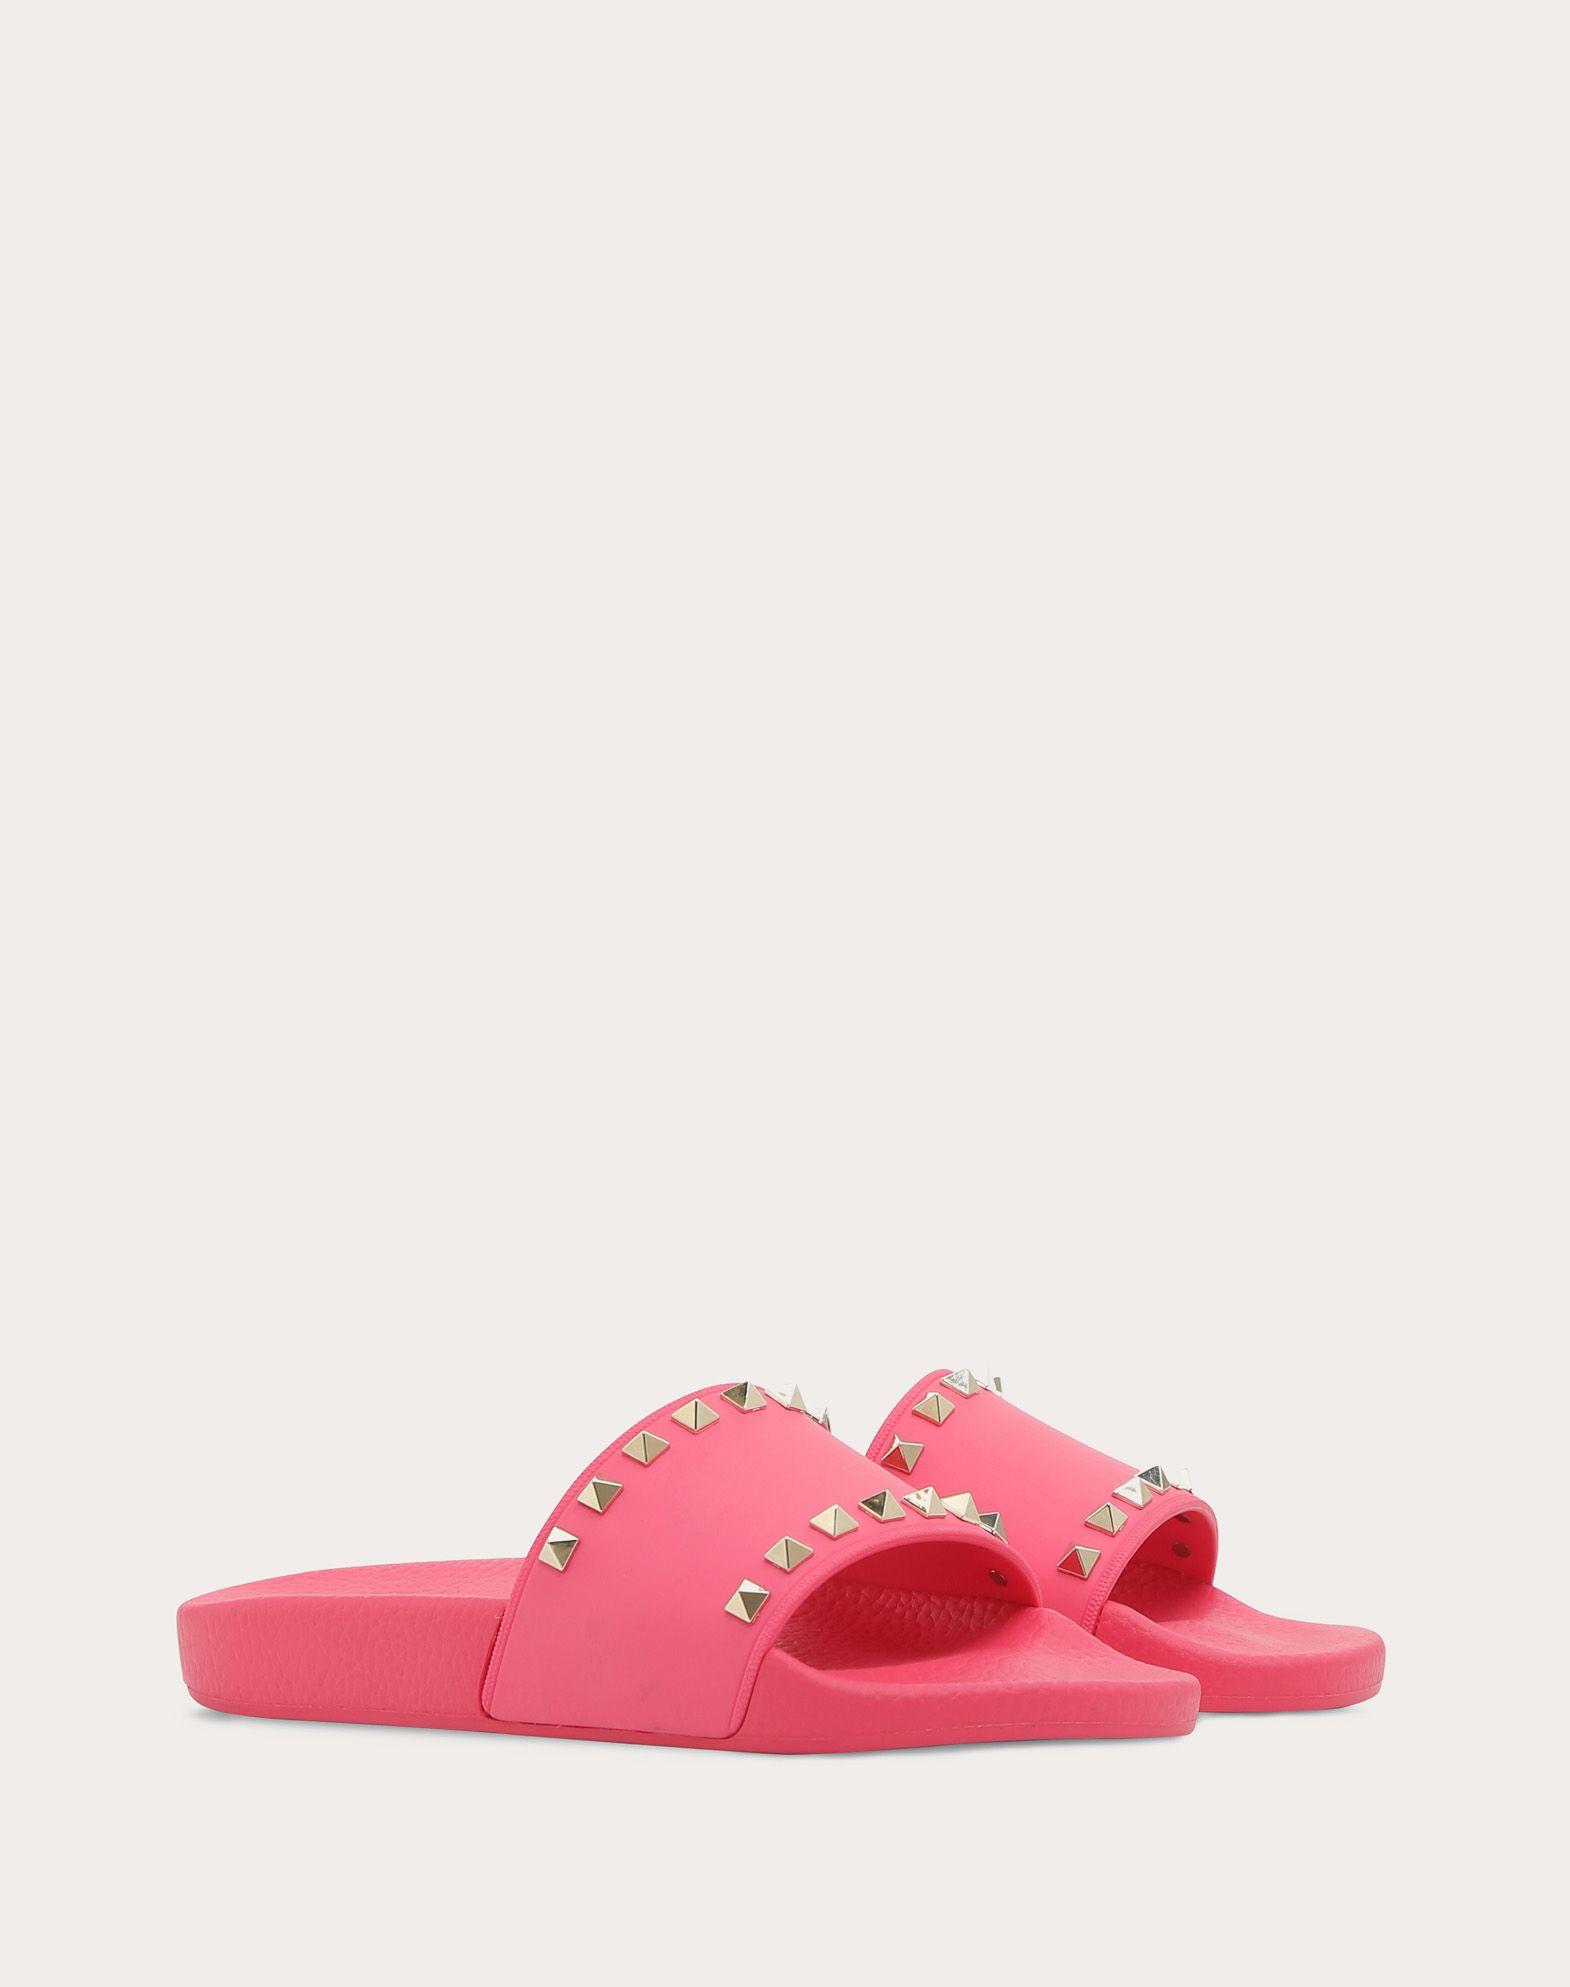 VALENTINO GARAVANI Rockstud PVC Slide Sandal SLIDE SANDAL D r